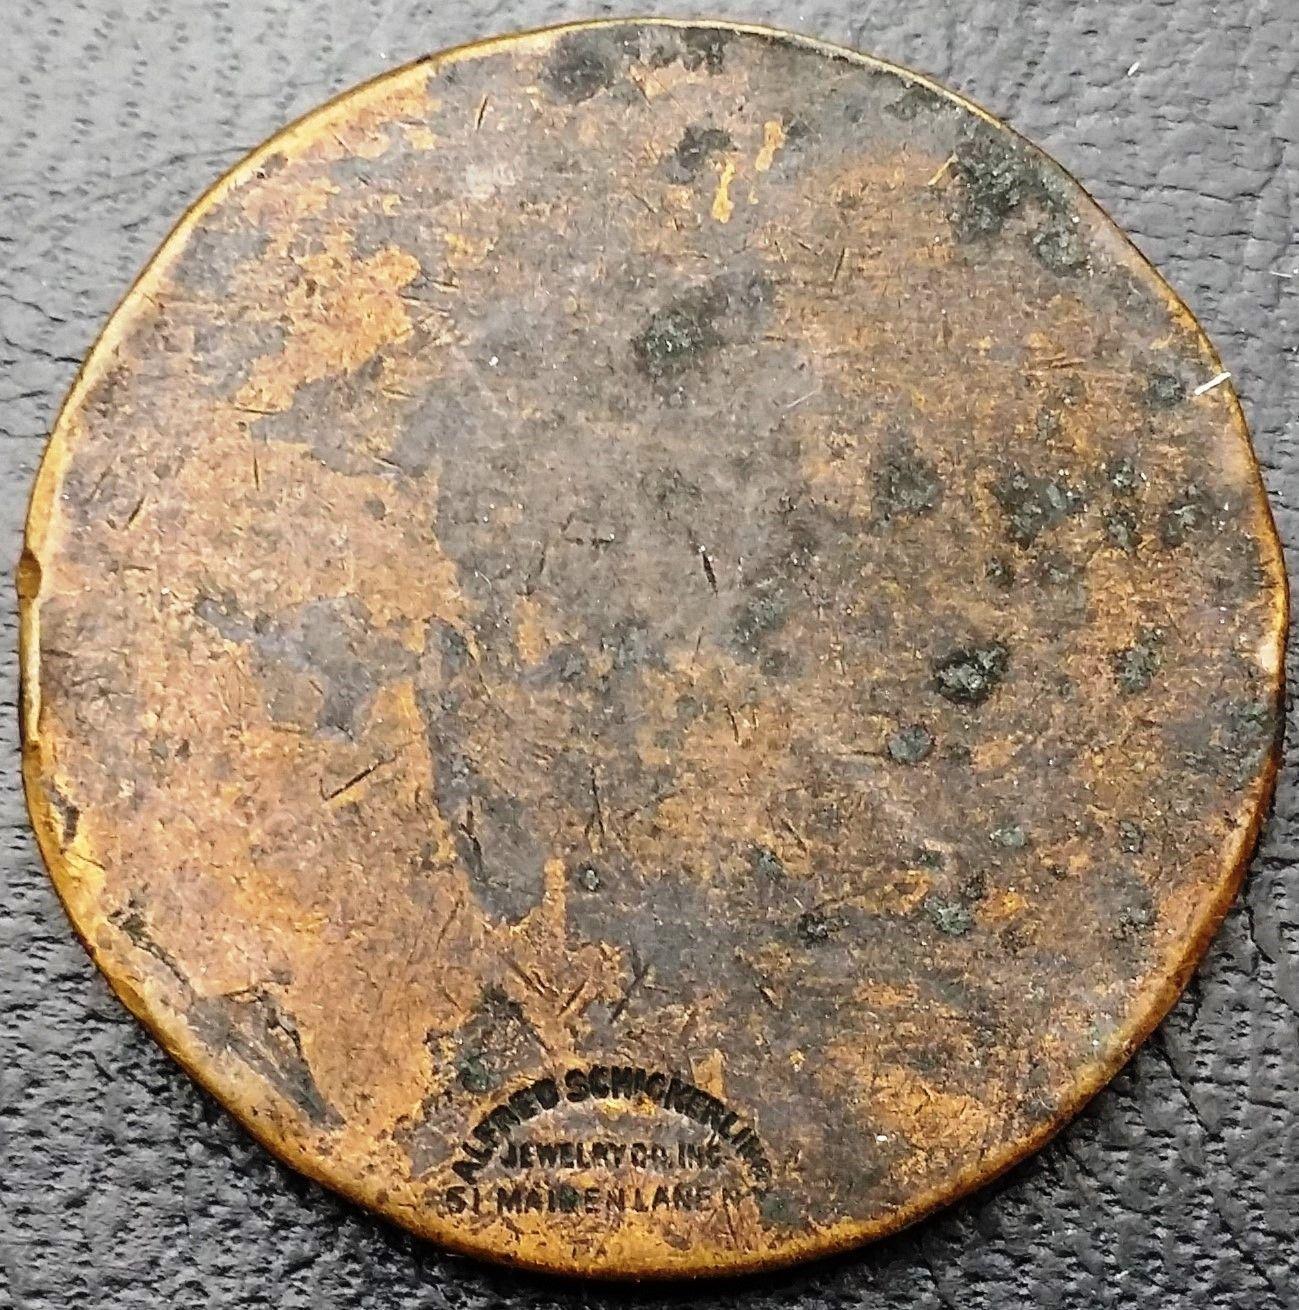 1918 BPOE Elks Lodge Jersey City Fraternal Order Medal - Alfred Schickerling NYC image 2